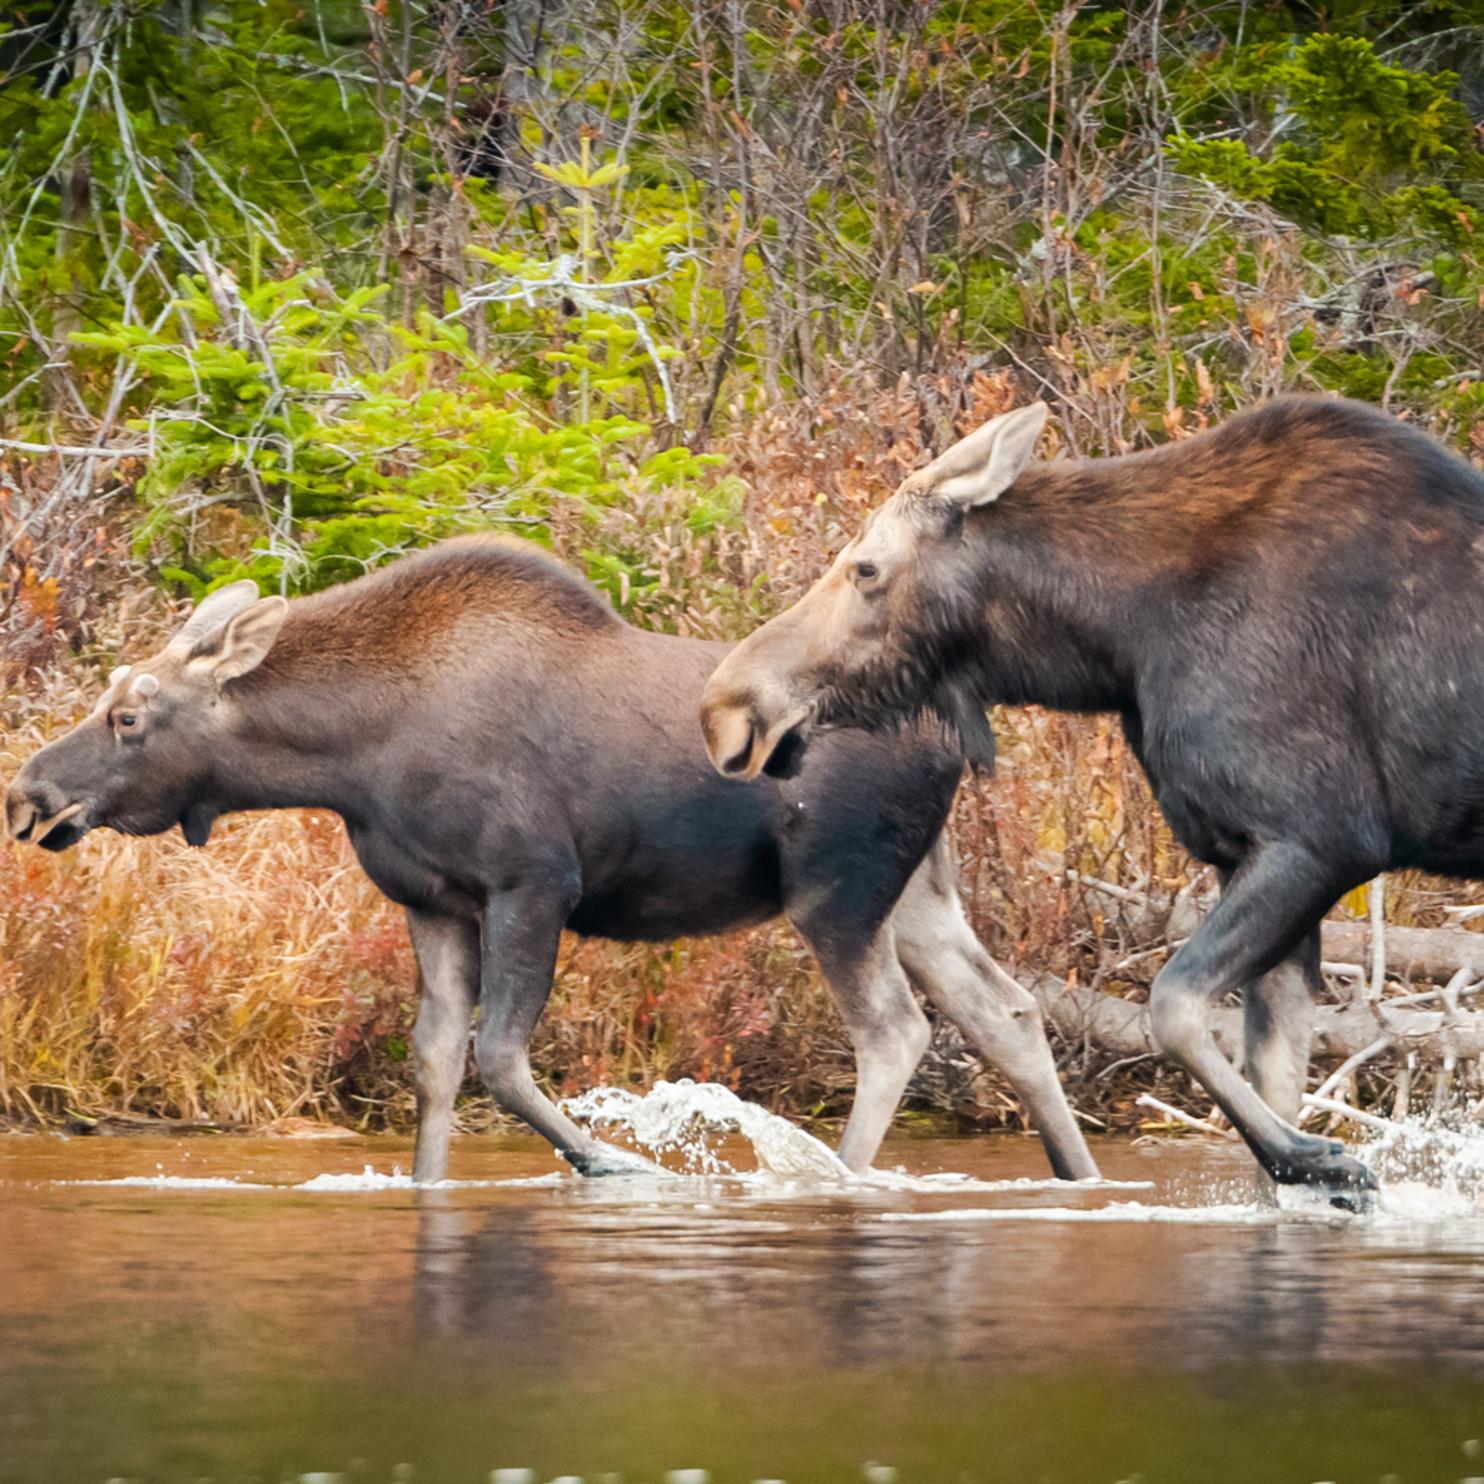 Moose race jgq550